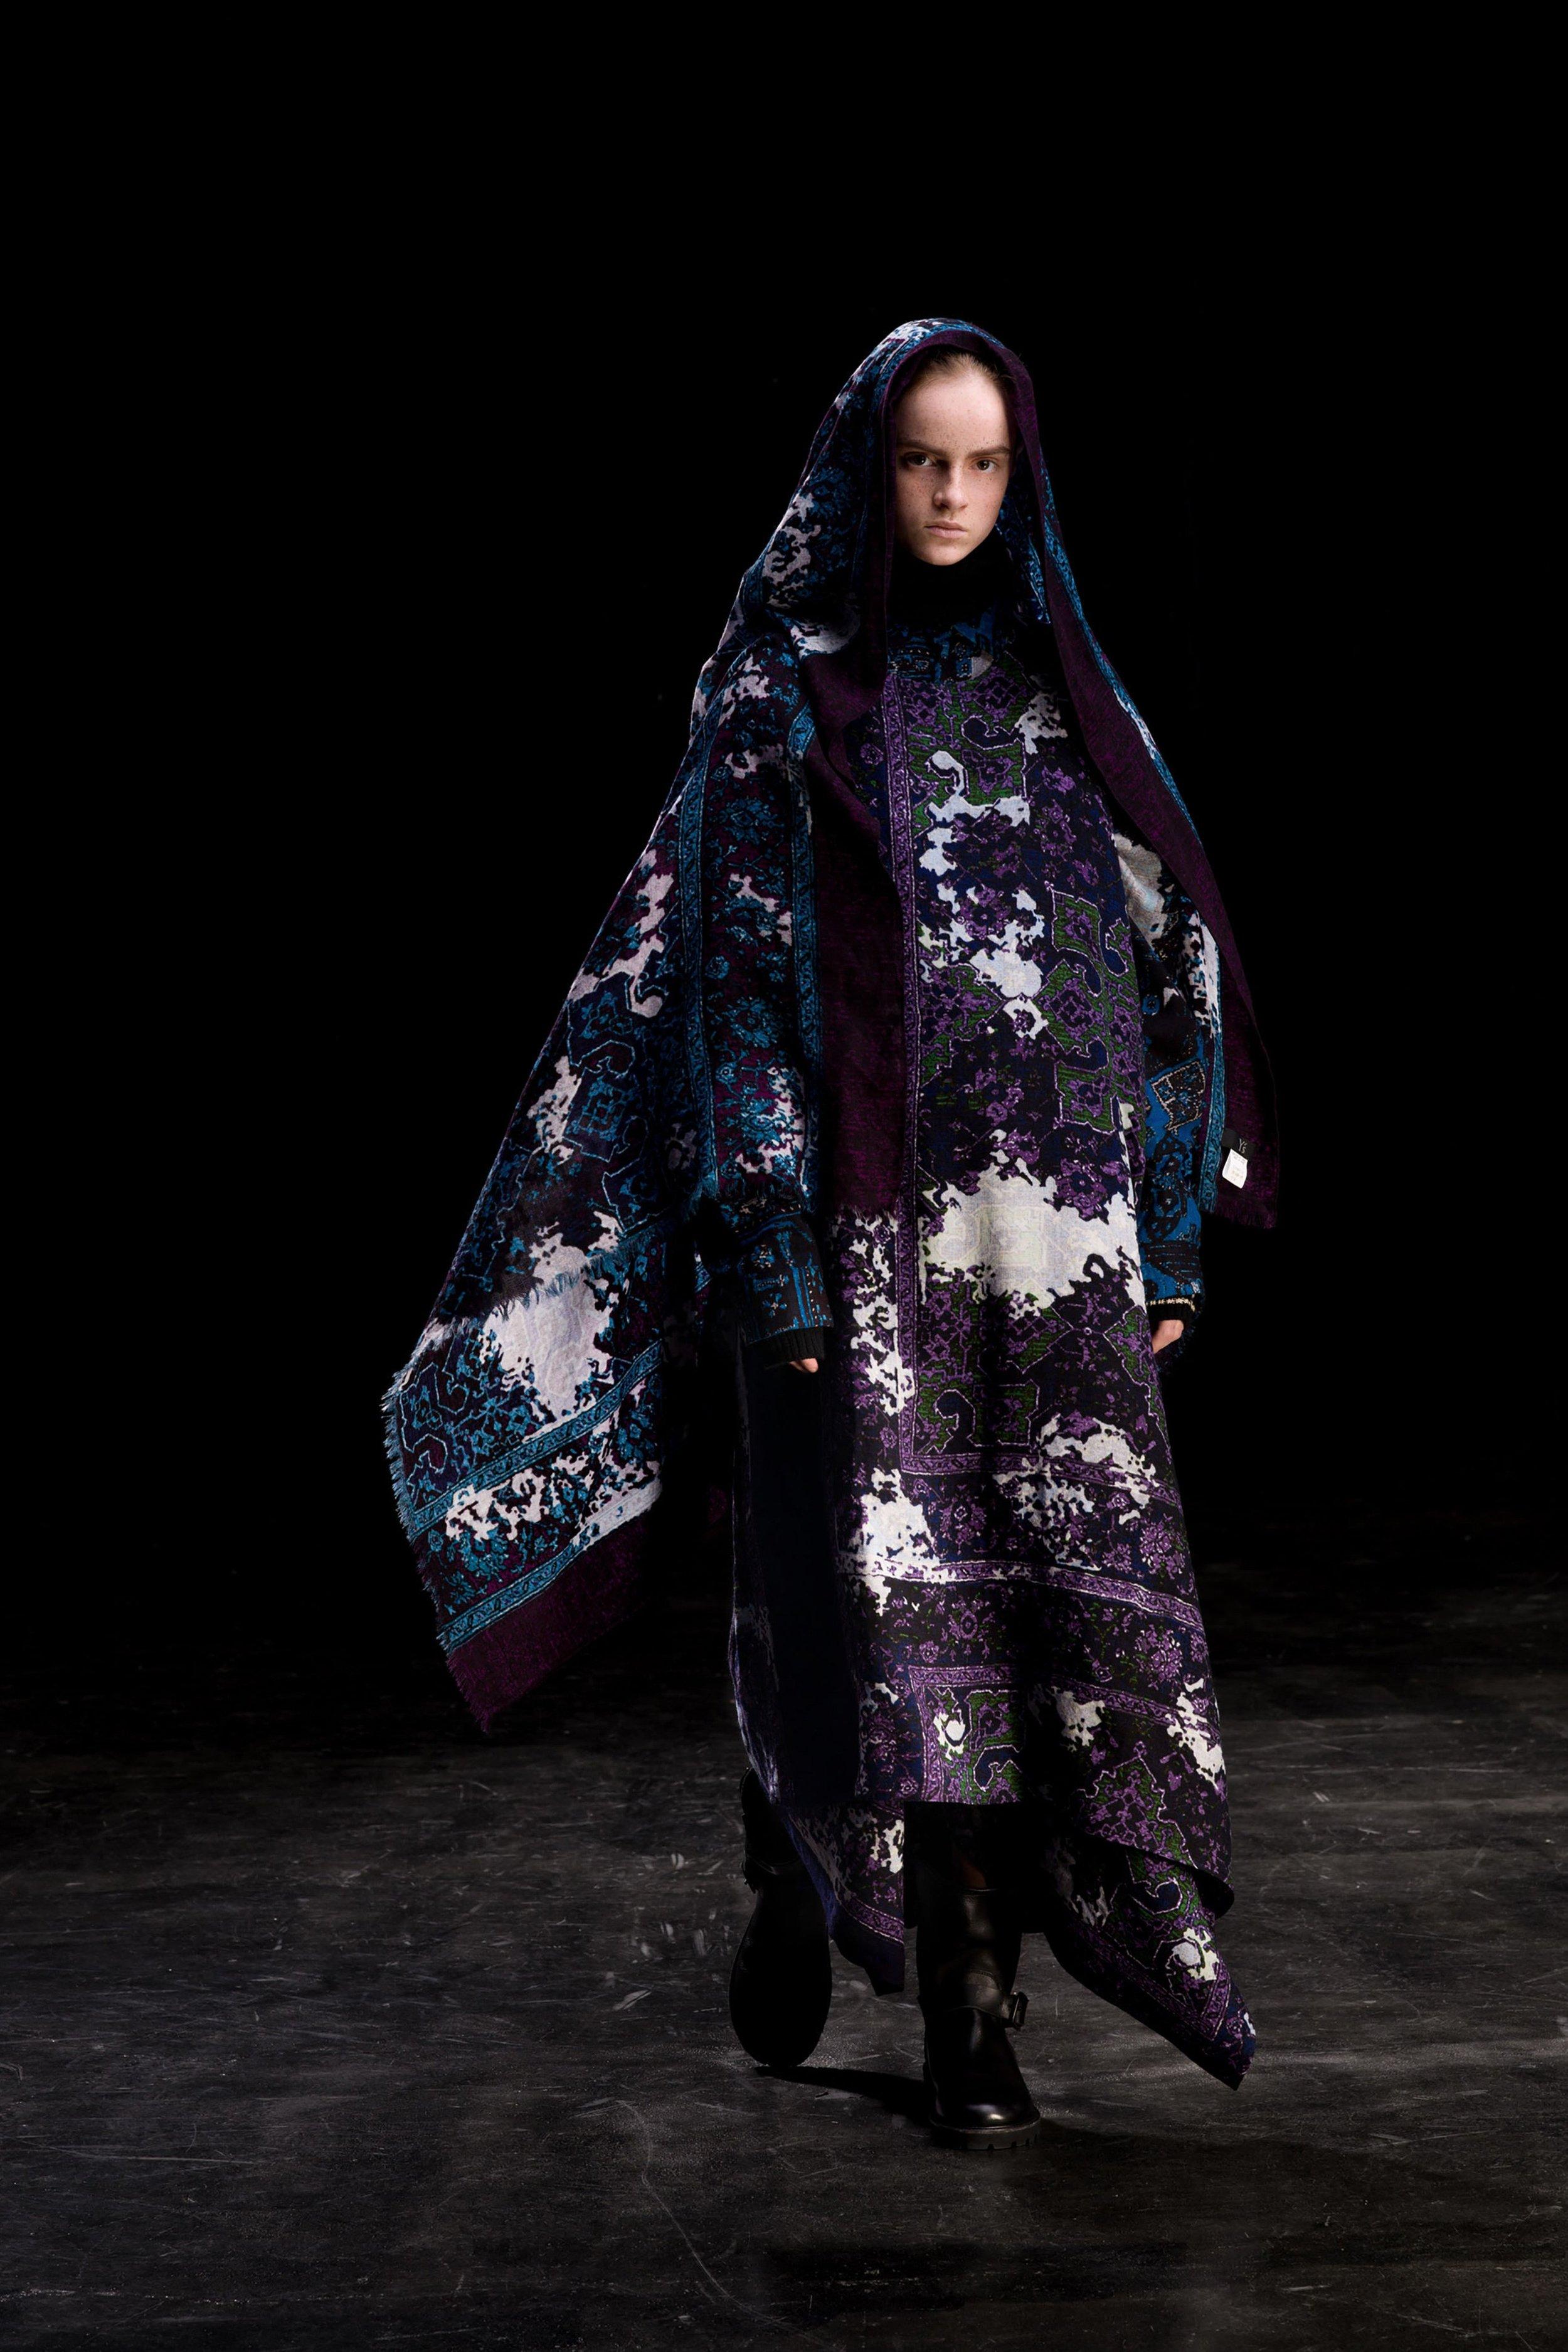 00029-Ys-Yohji-Yamamoto-FALL-19-Ready-To-Wear.jpg